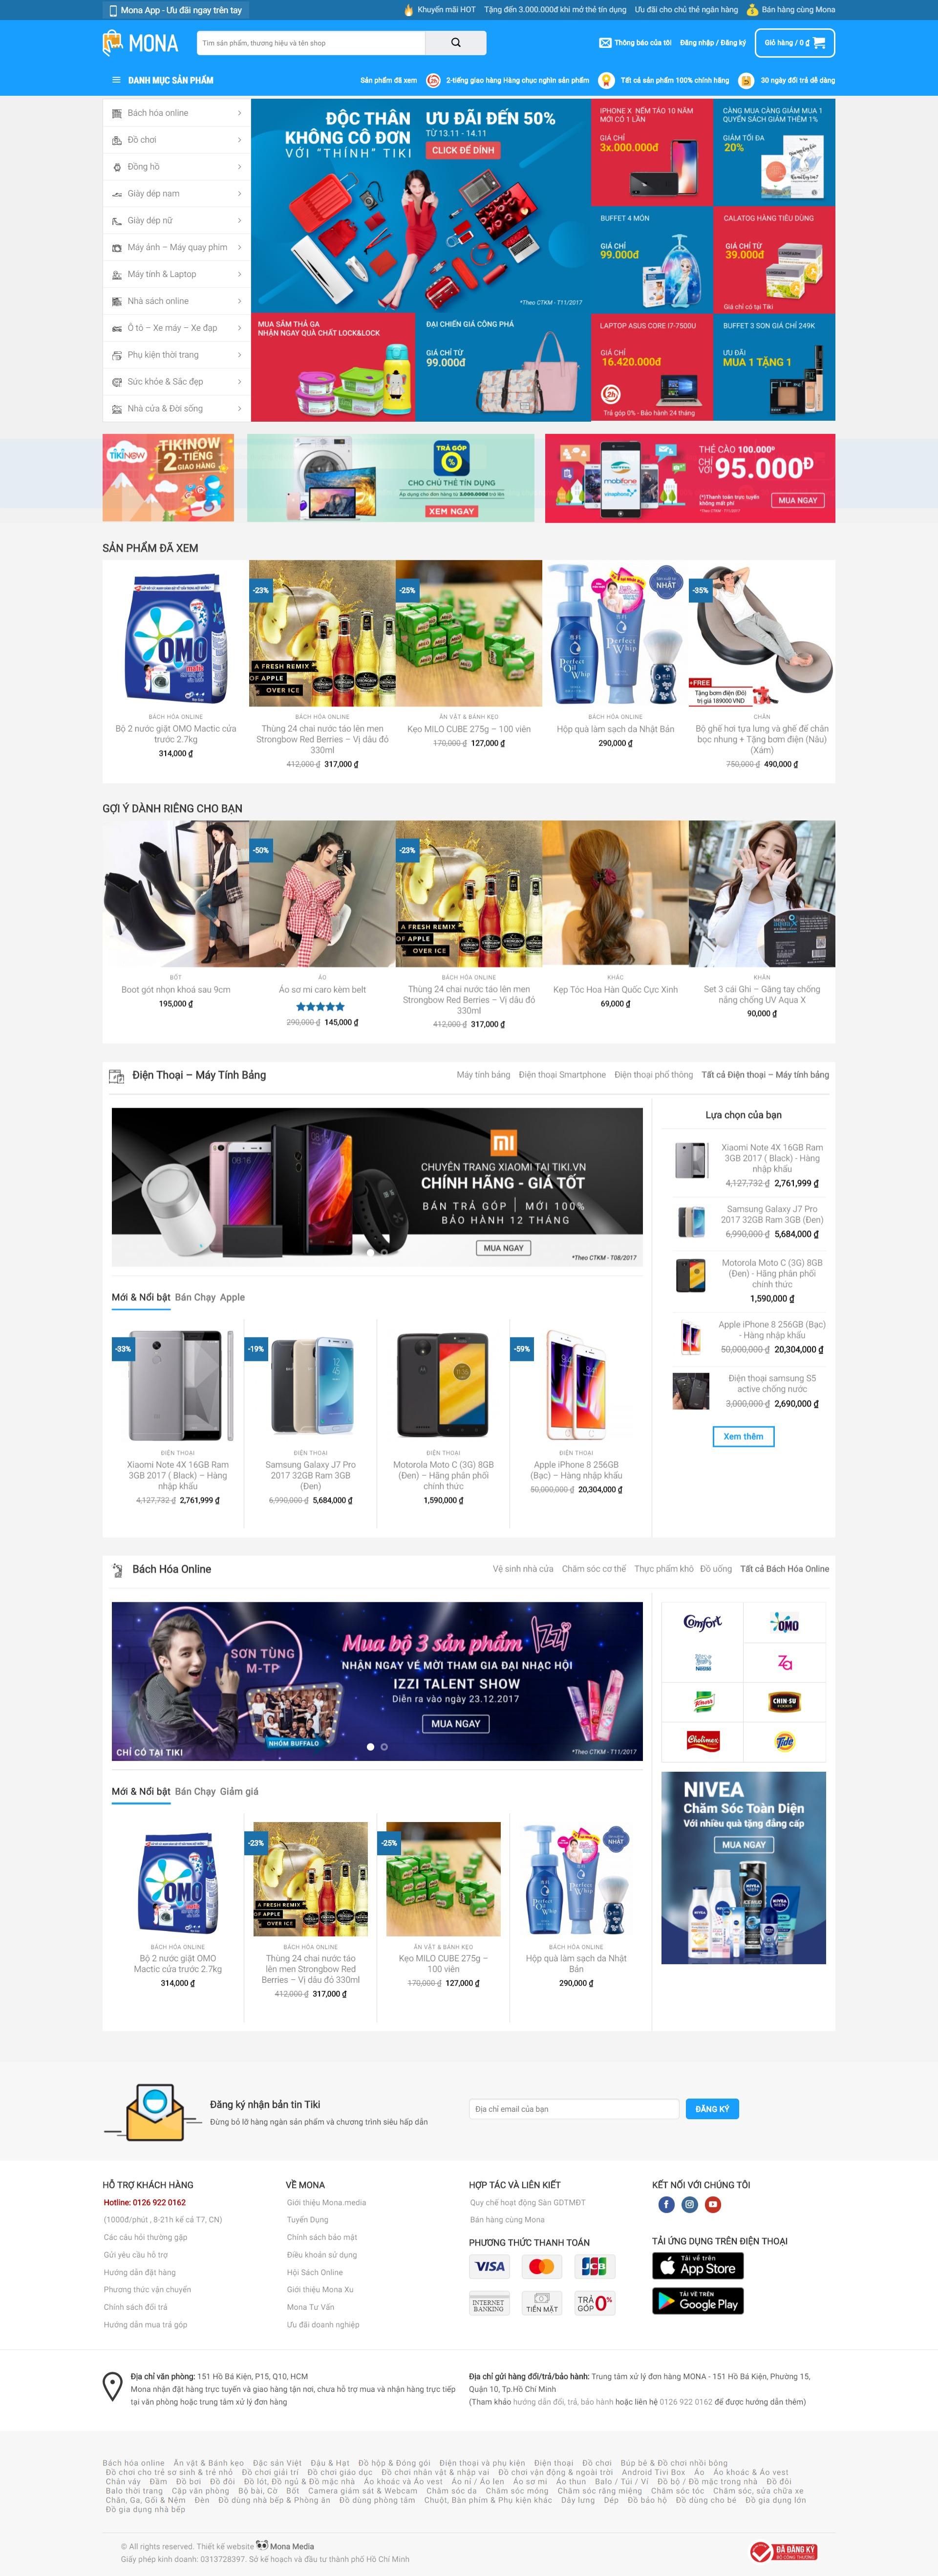 Mẫu website bách hóa tổng hợp đẹp